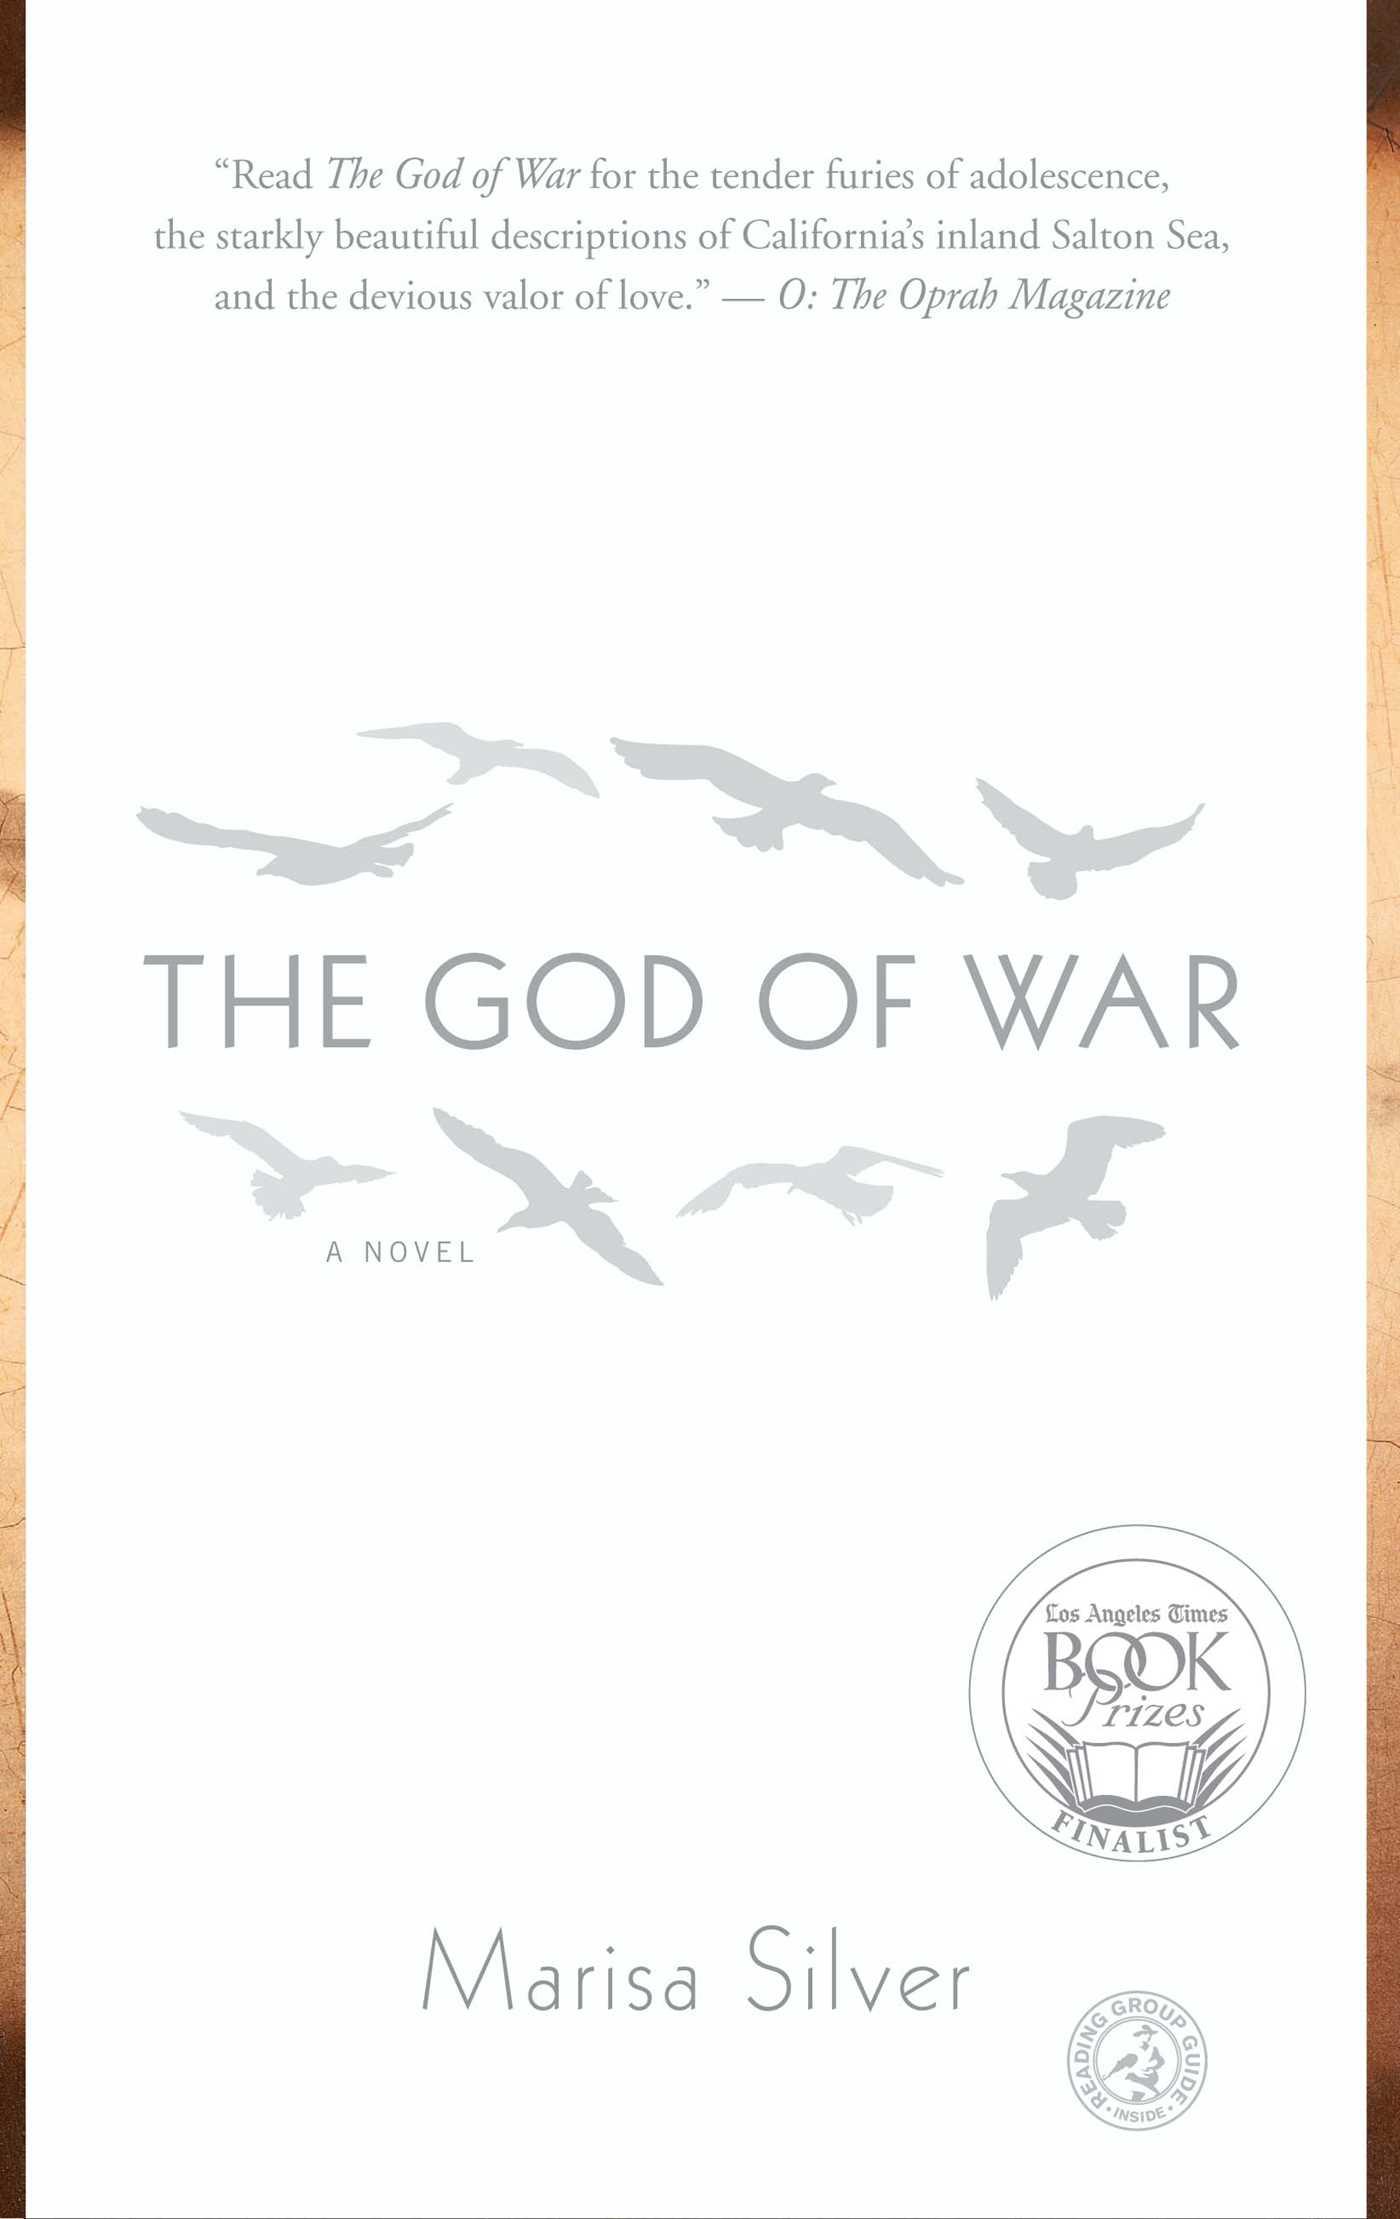 God of war 9781416563303 hr